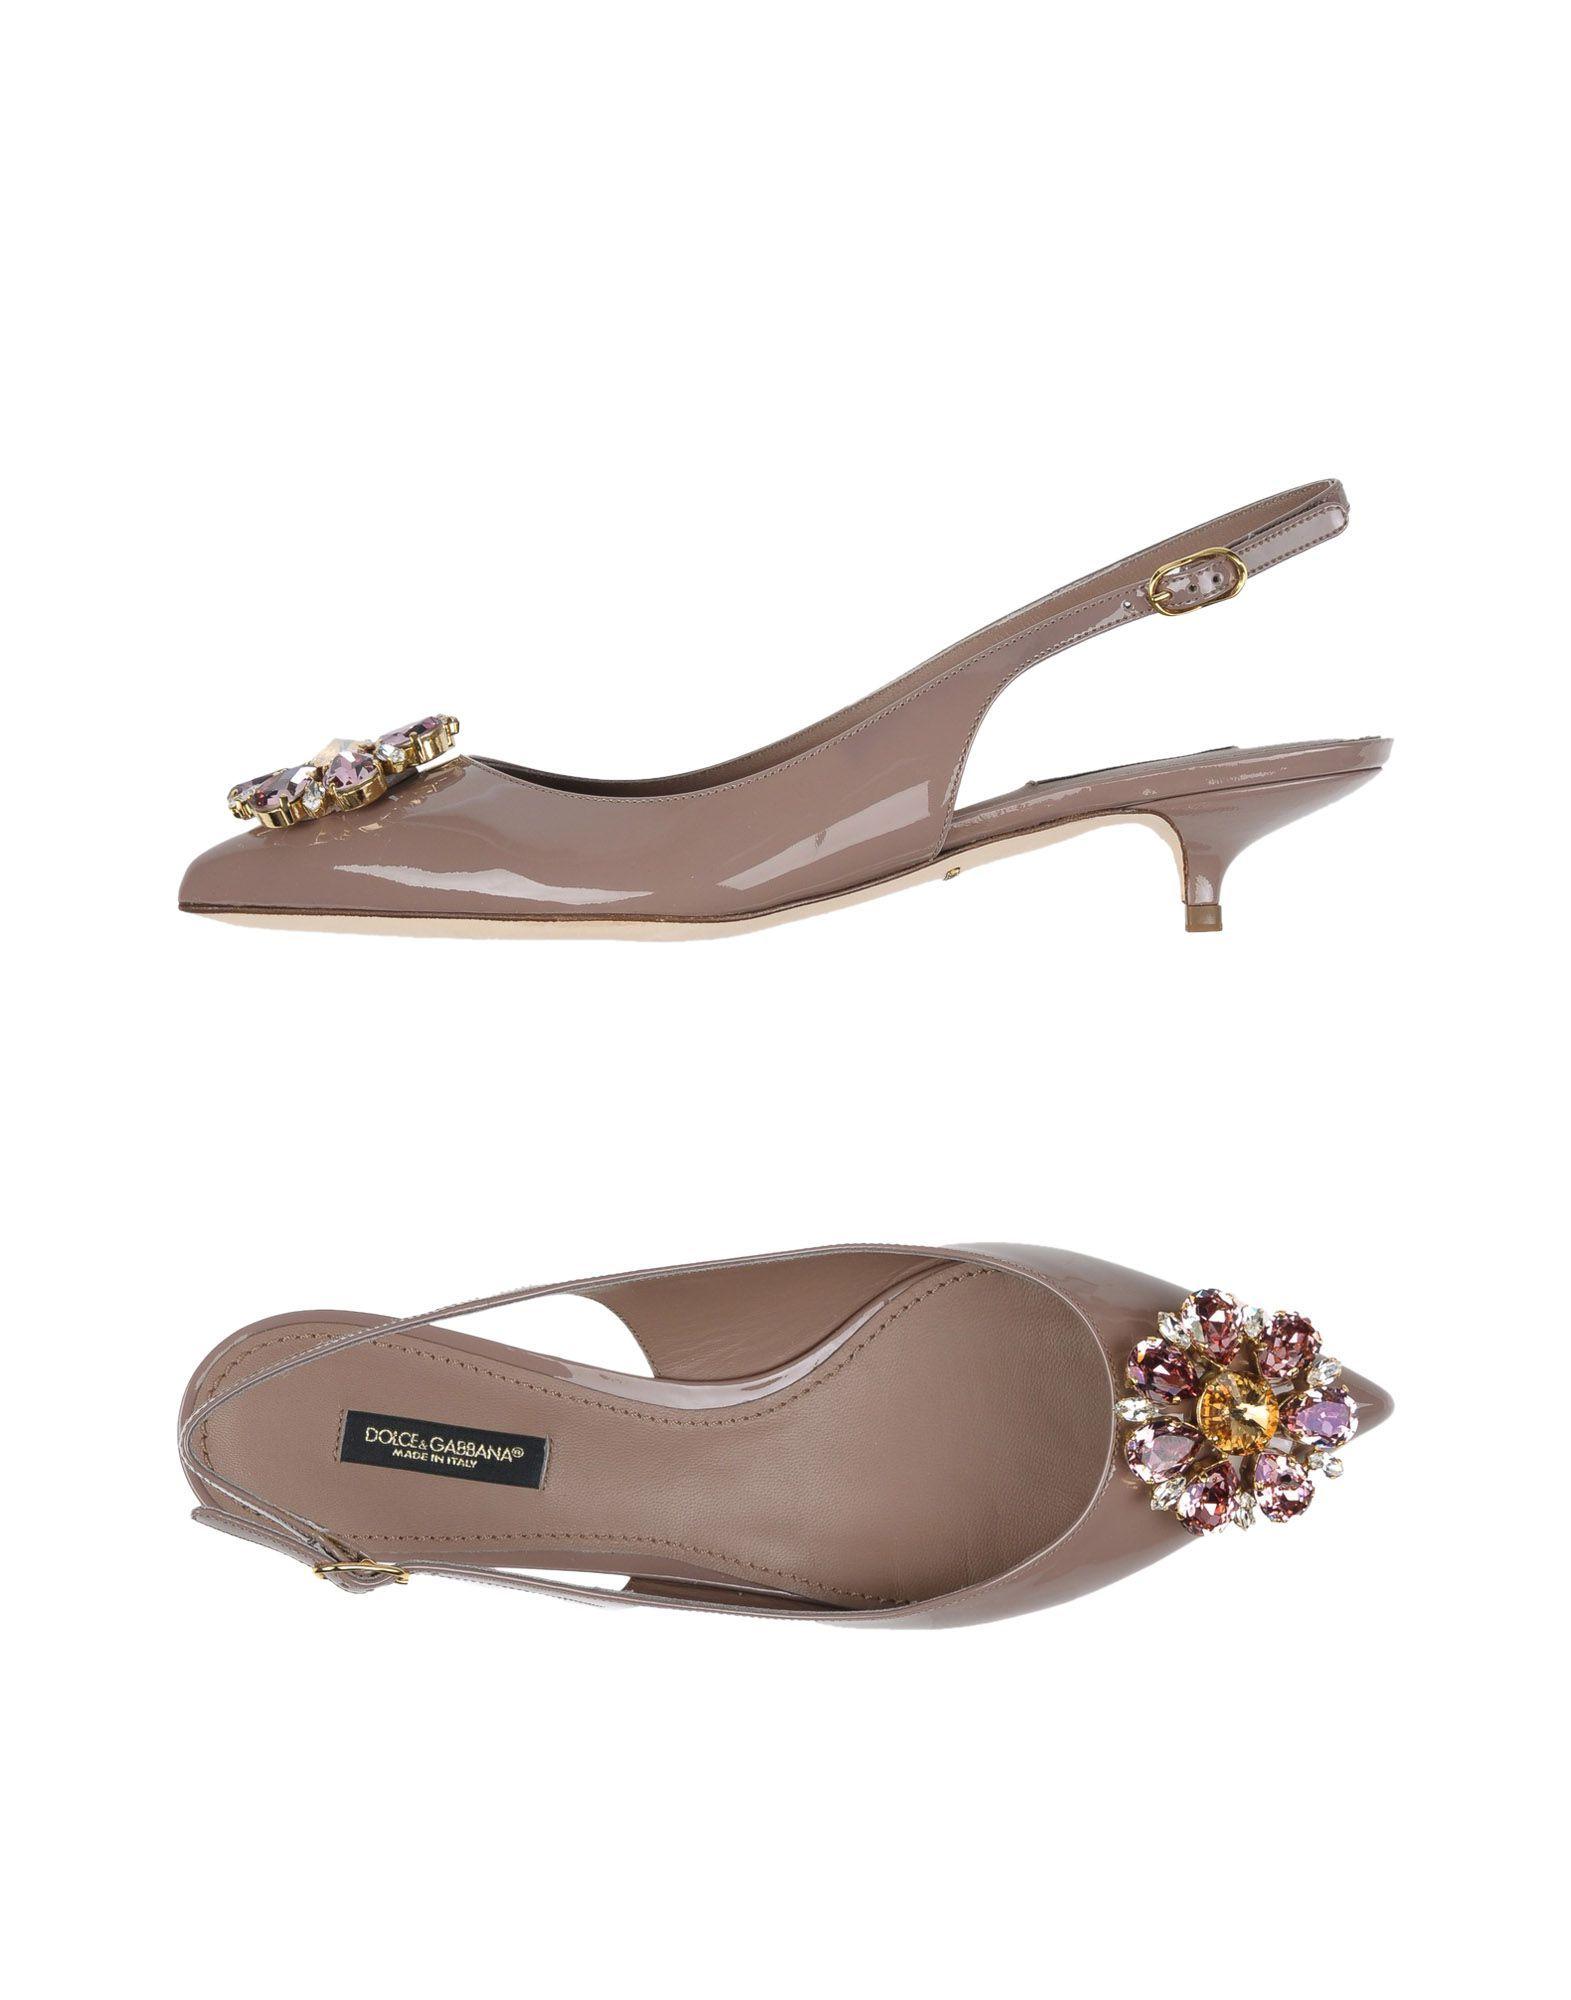 9fe773833a54c6 Dolce   Gabbana Pump - Women Dolce   Gabbana Pumps online on YOOX United  States - 11260613FG